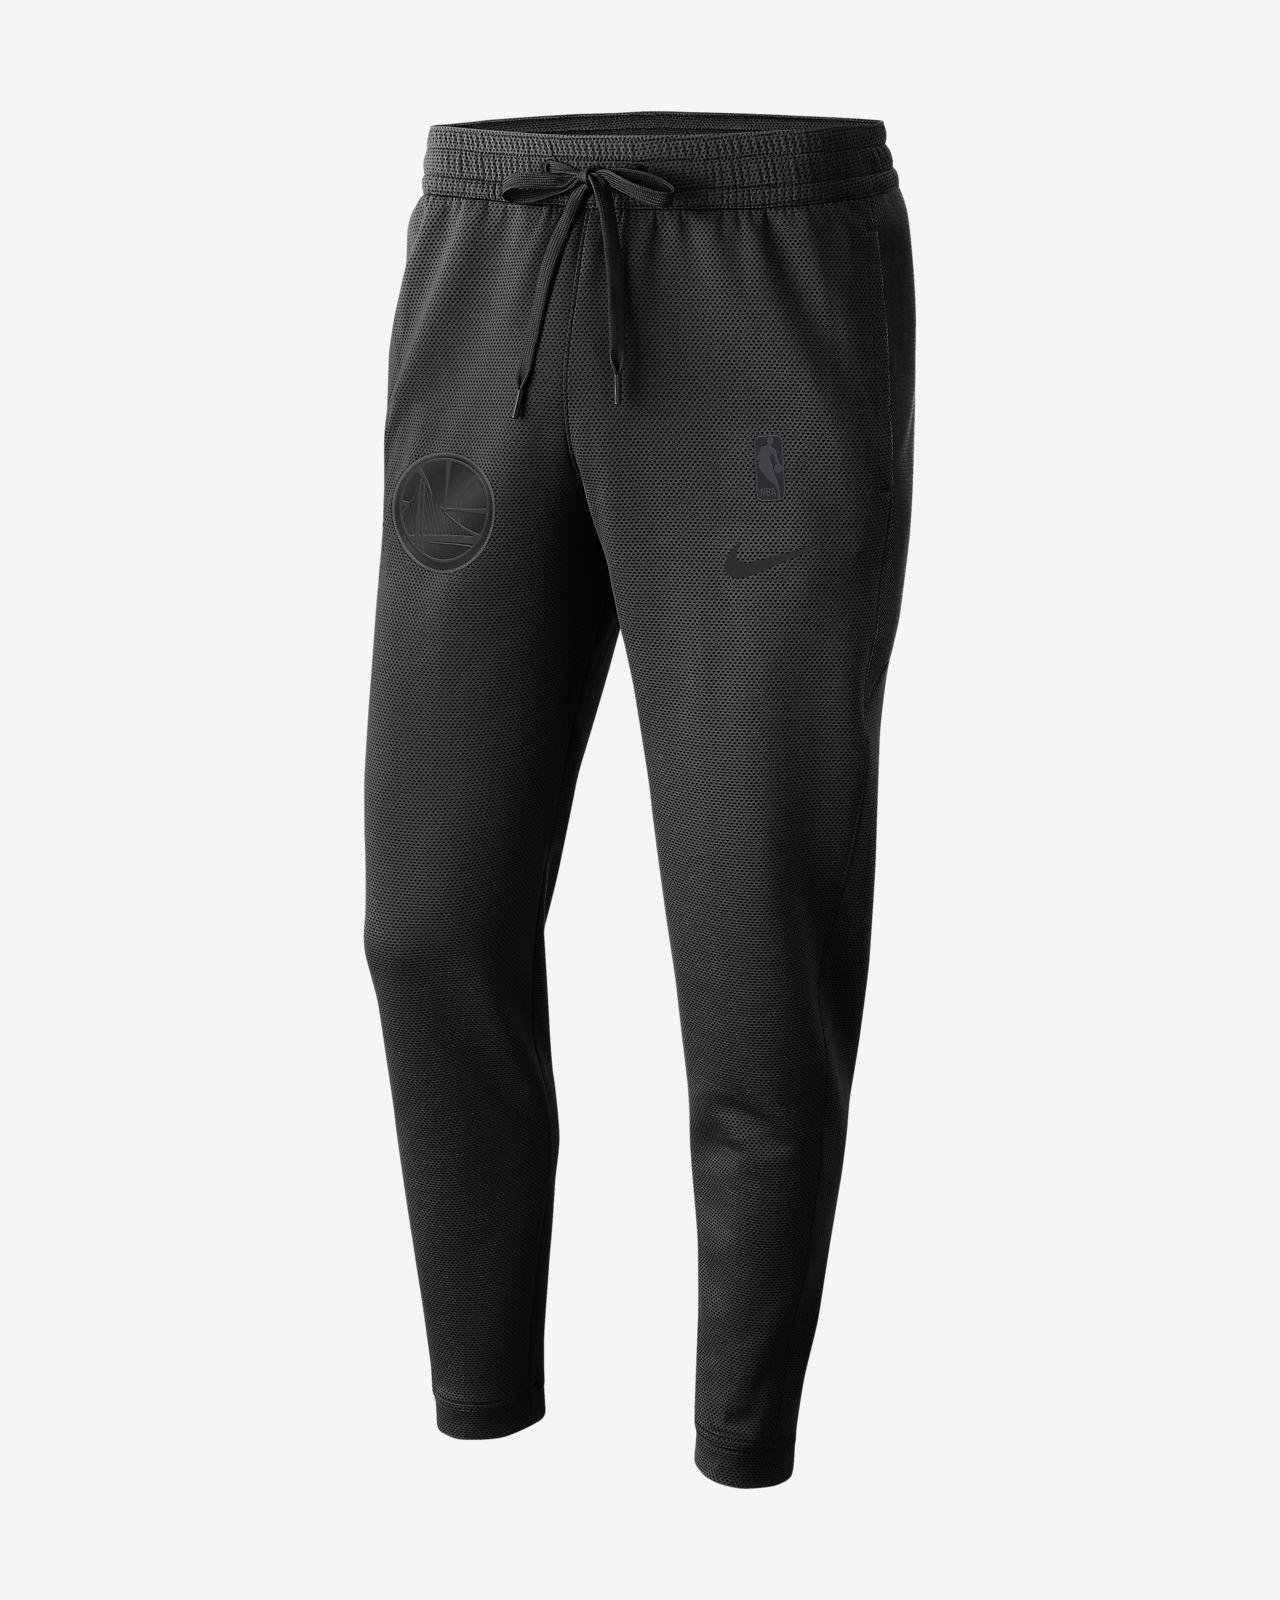 Showtime Pour State Therma Nba Golden Nike Pantalon Flex Warriors A3RL4cq5j